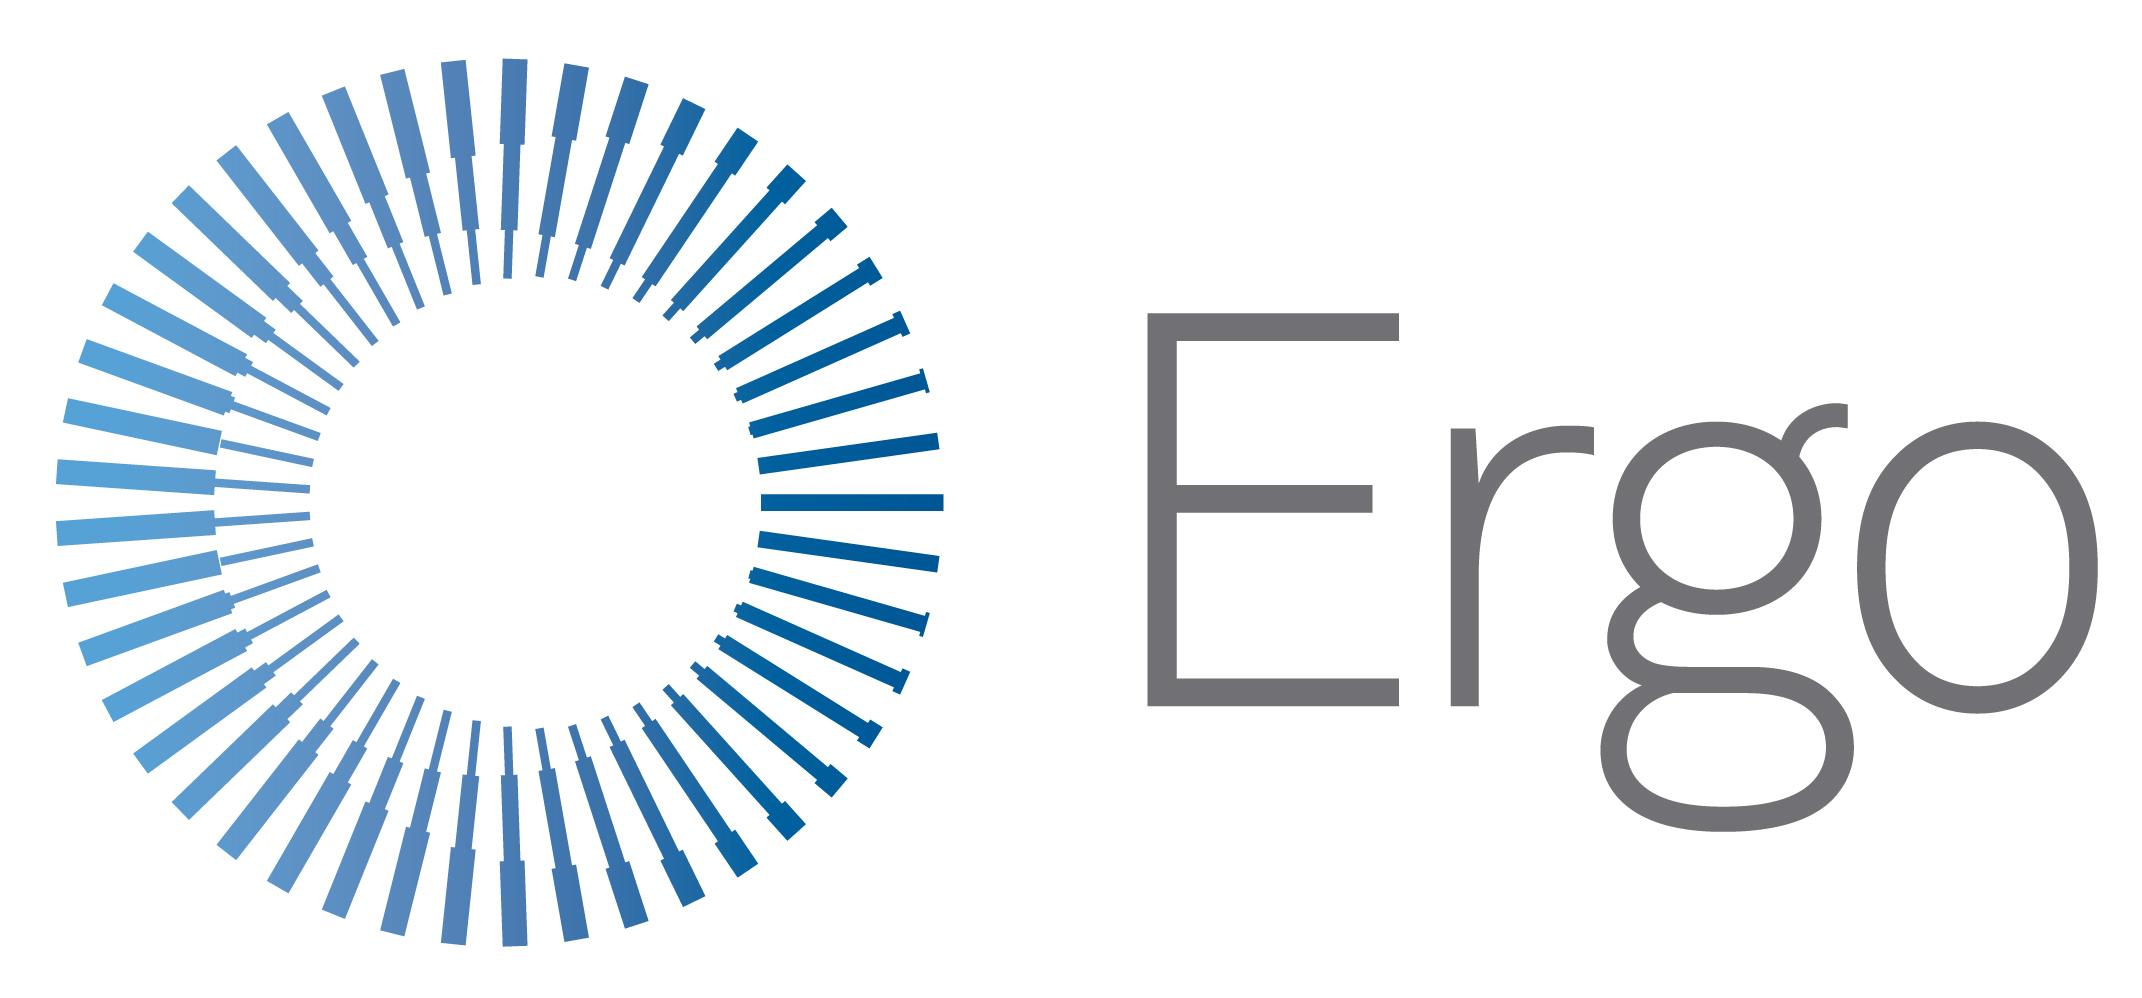 Ergo_Logo_(1).jpg